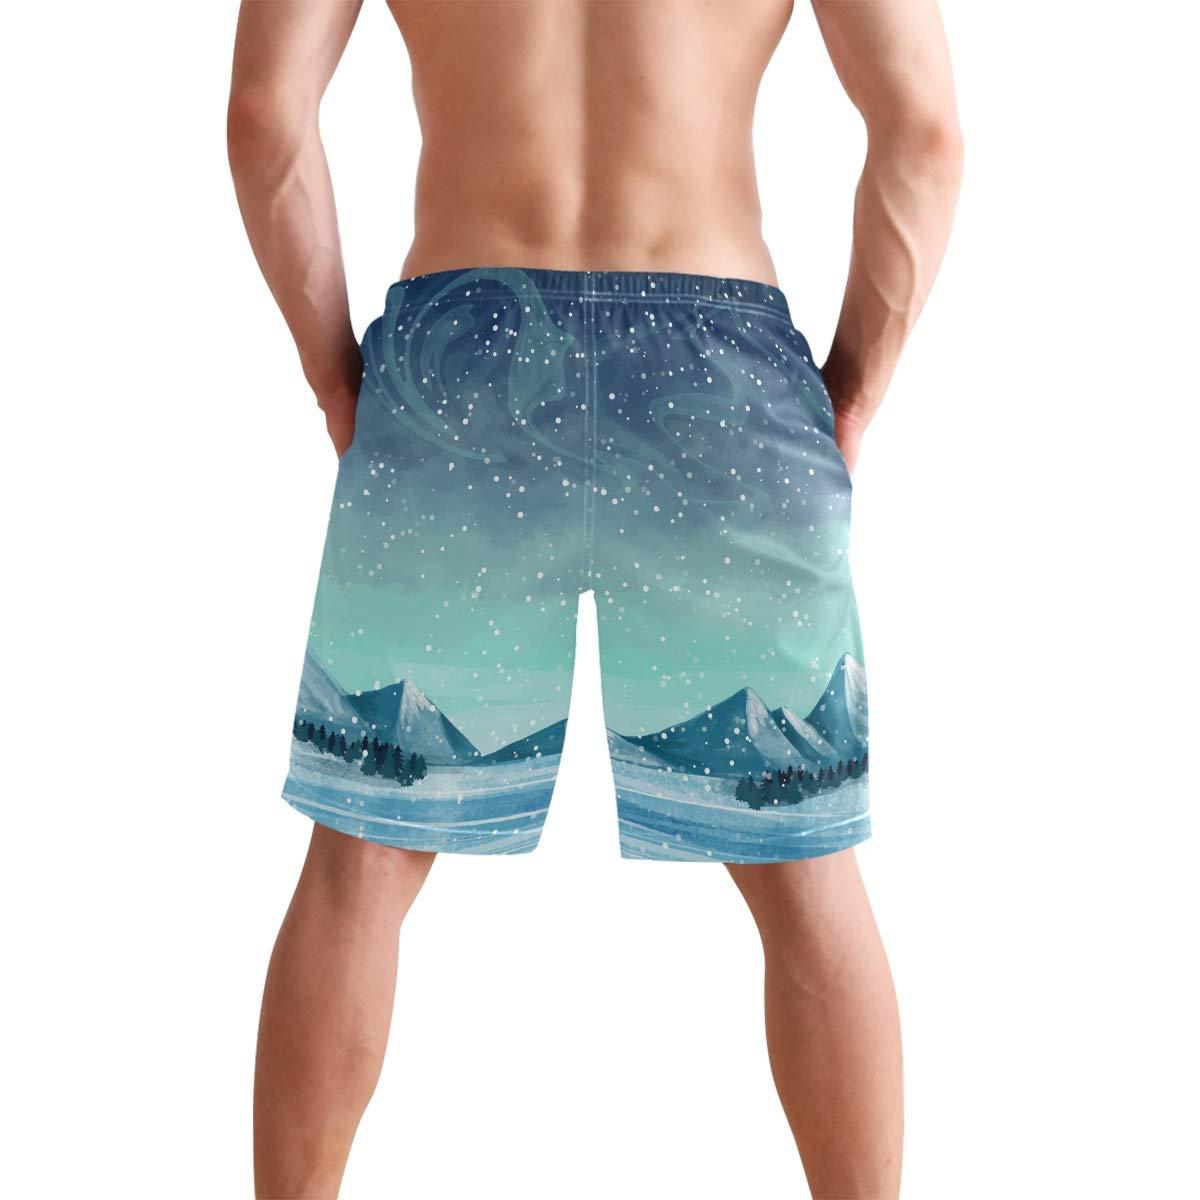 Men/'s Swim Trunks Beach Board Swimwear Shorts Snowy Evening Swimming Short Pants Quick Dry Water Shorts Mesh Lining